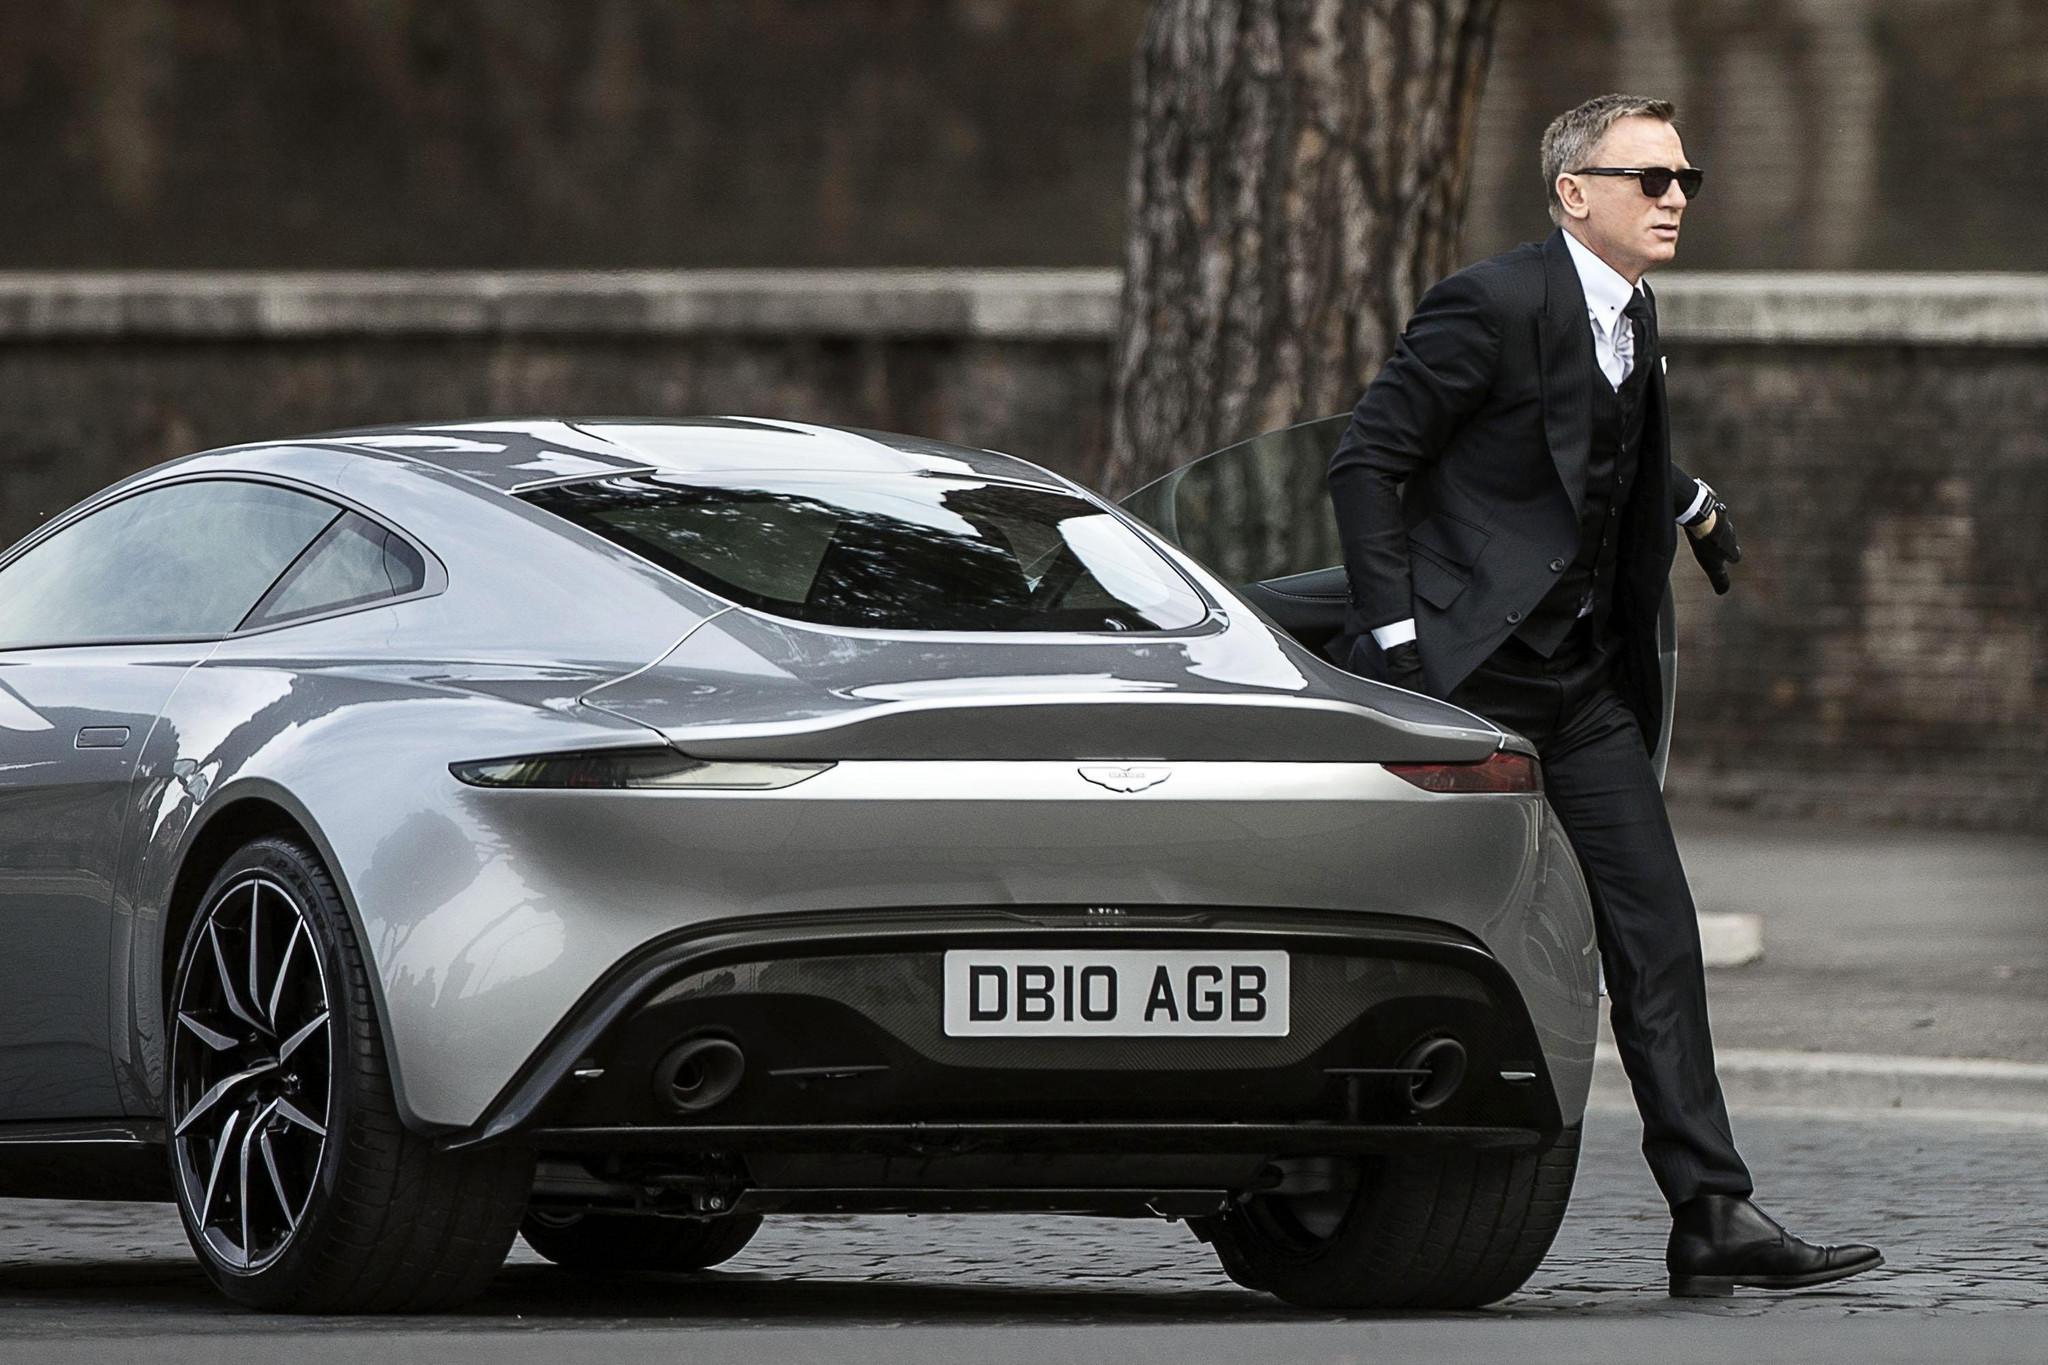 Bond walking away from his all new Aston Martin DB10